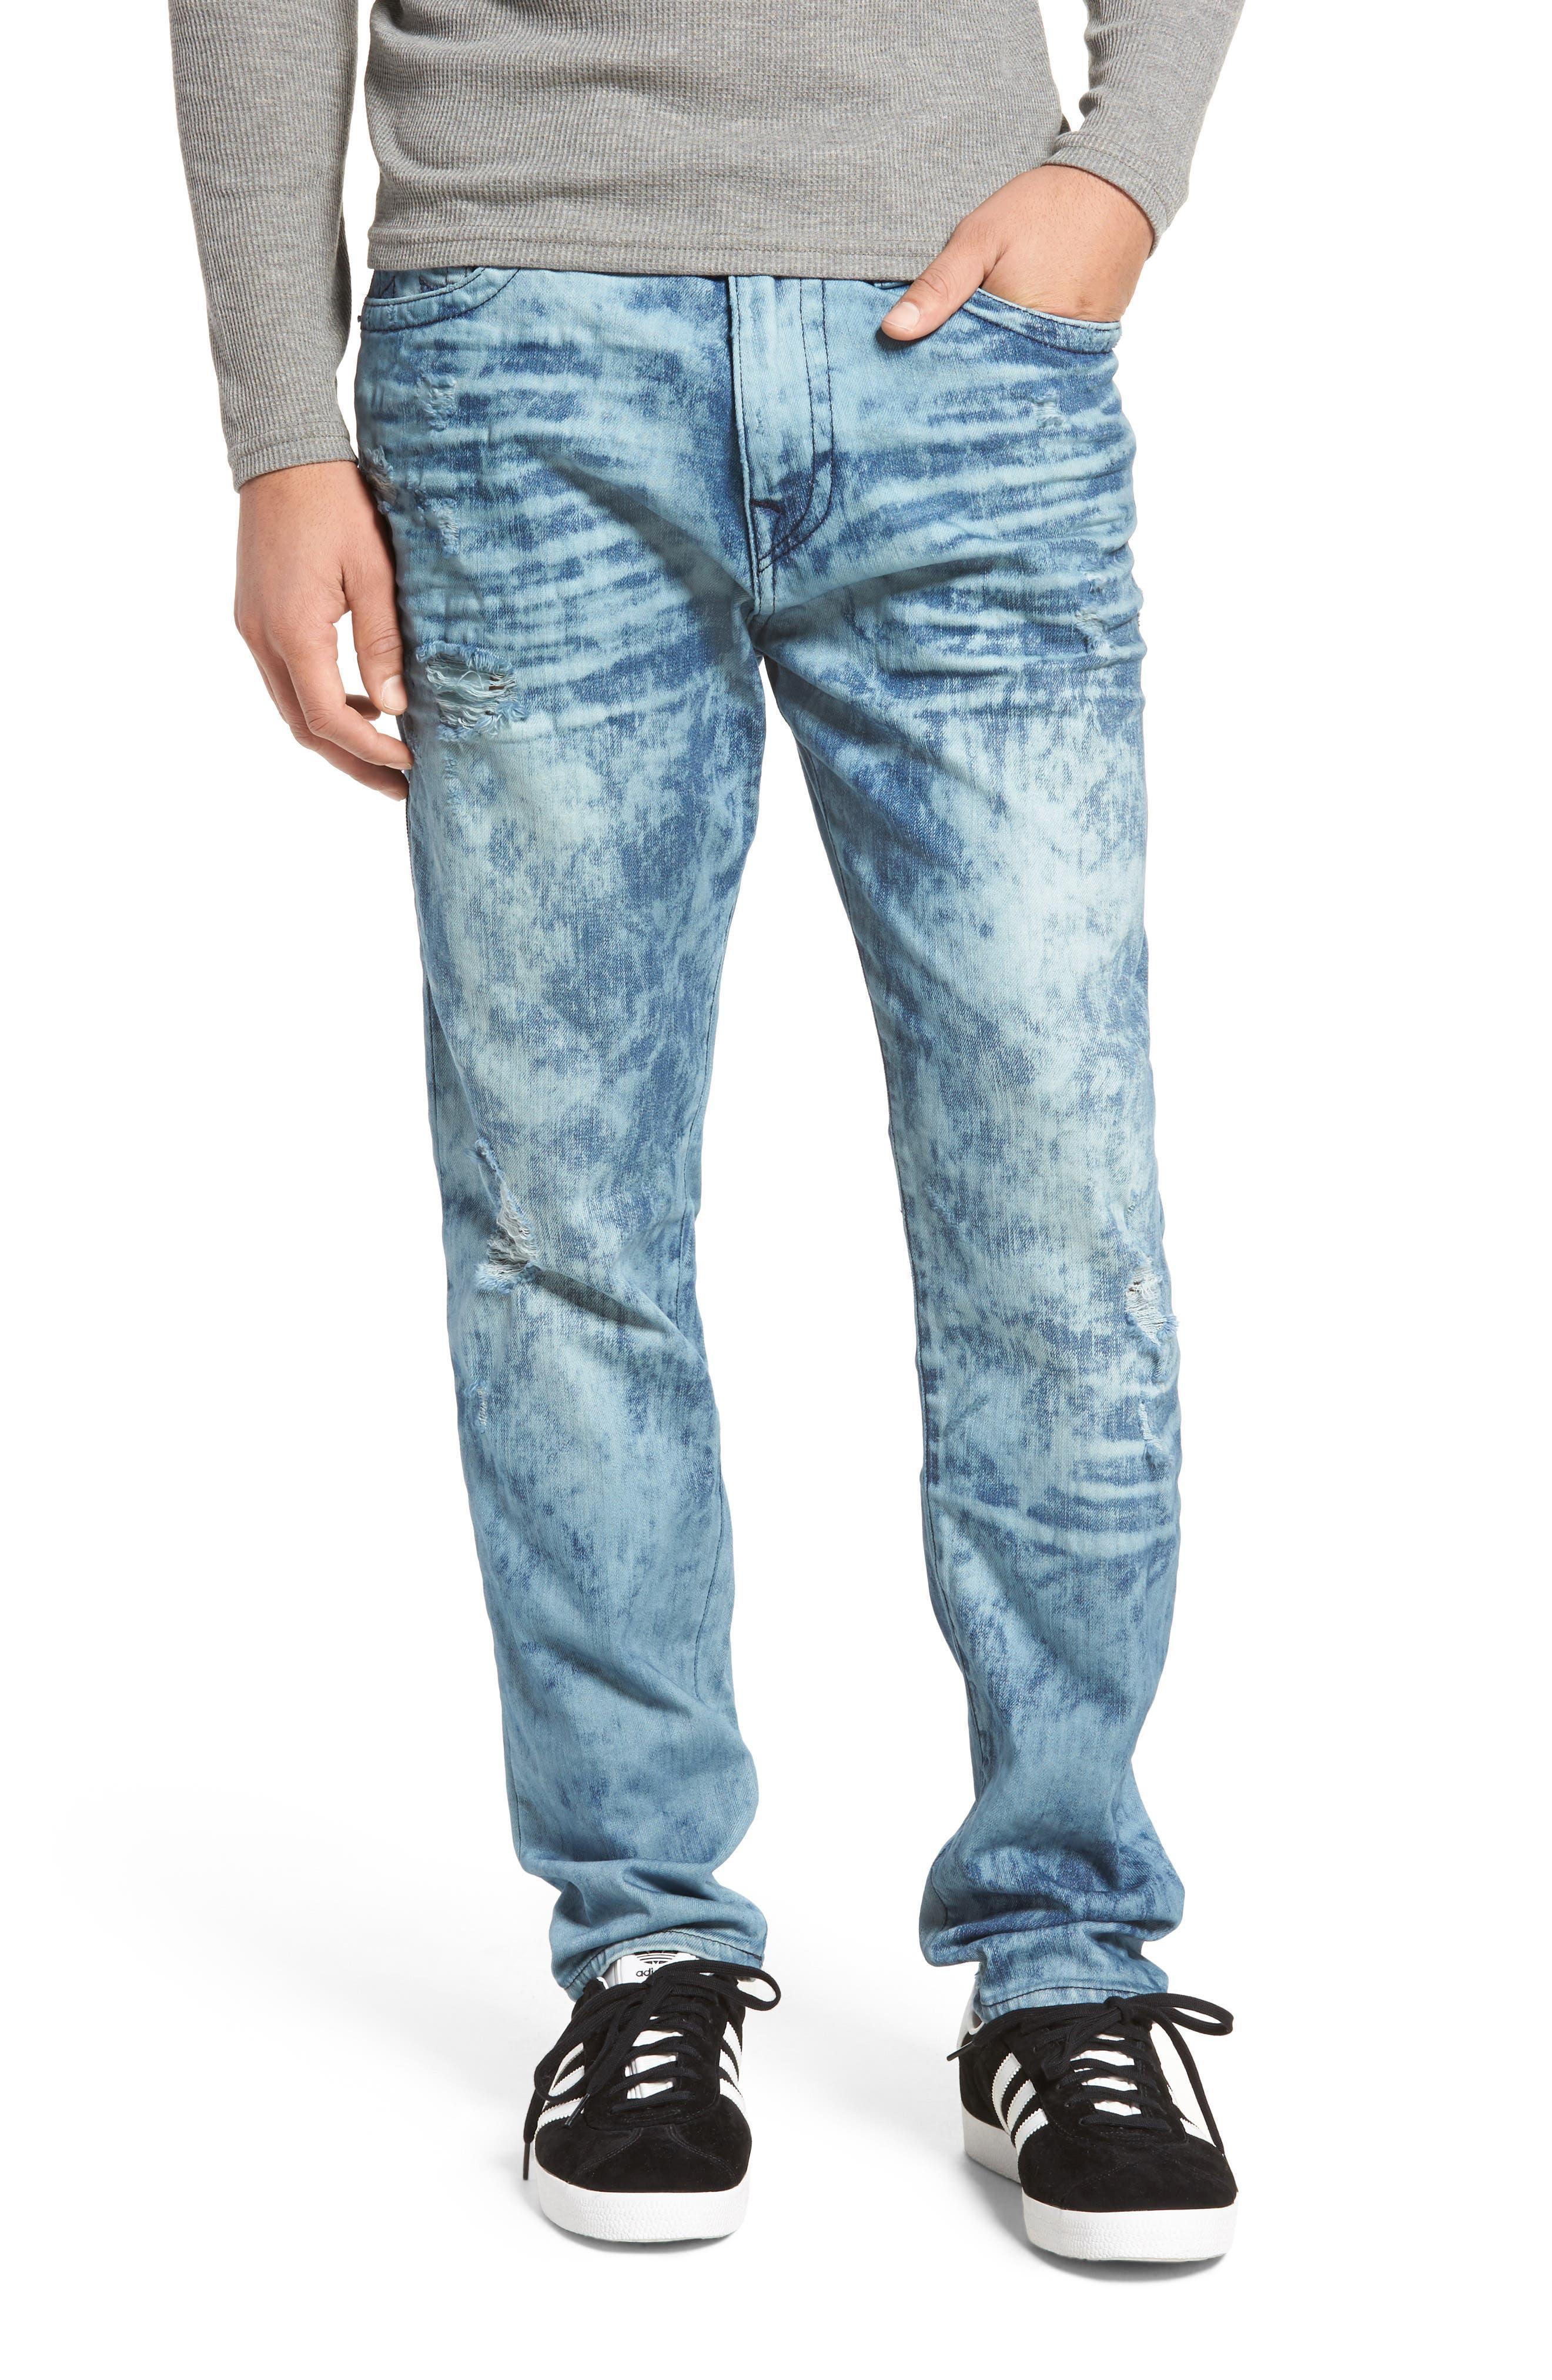 Mick Skinny Fit Jeans,                             Main thumbnail 1, color,                             401